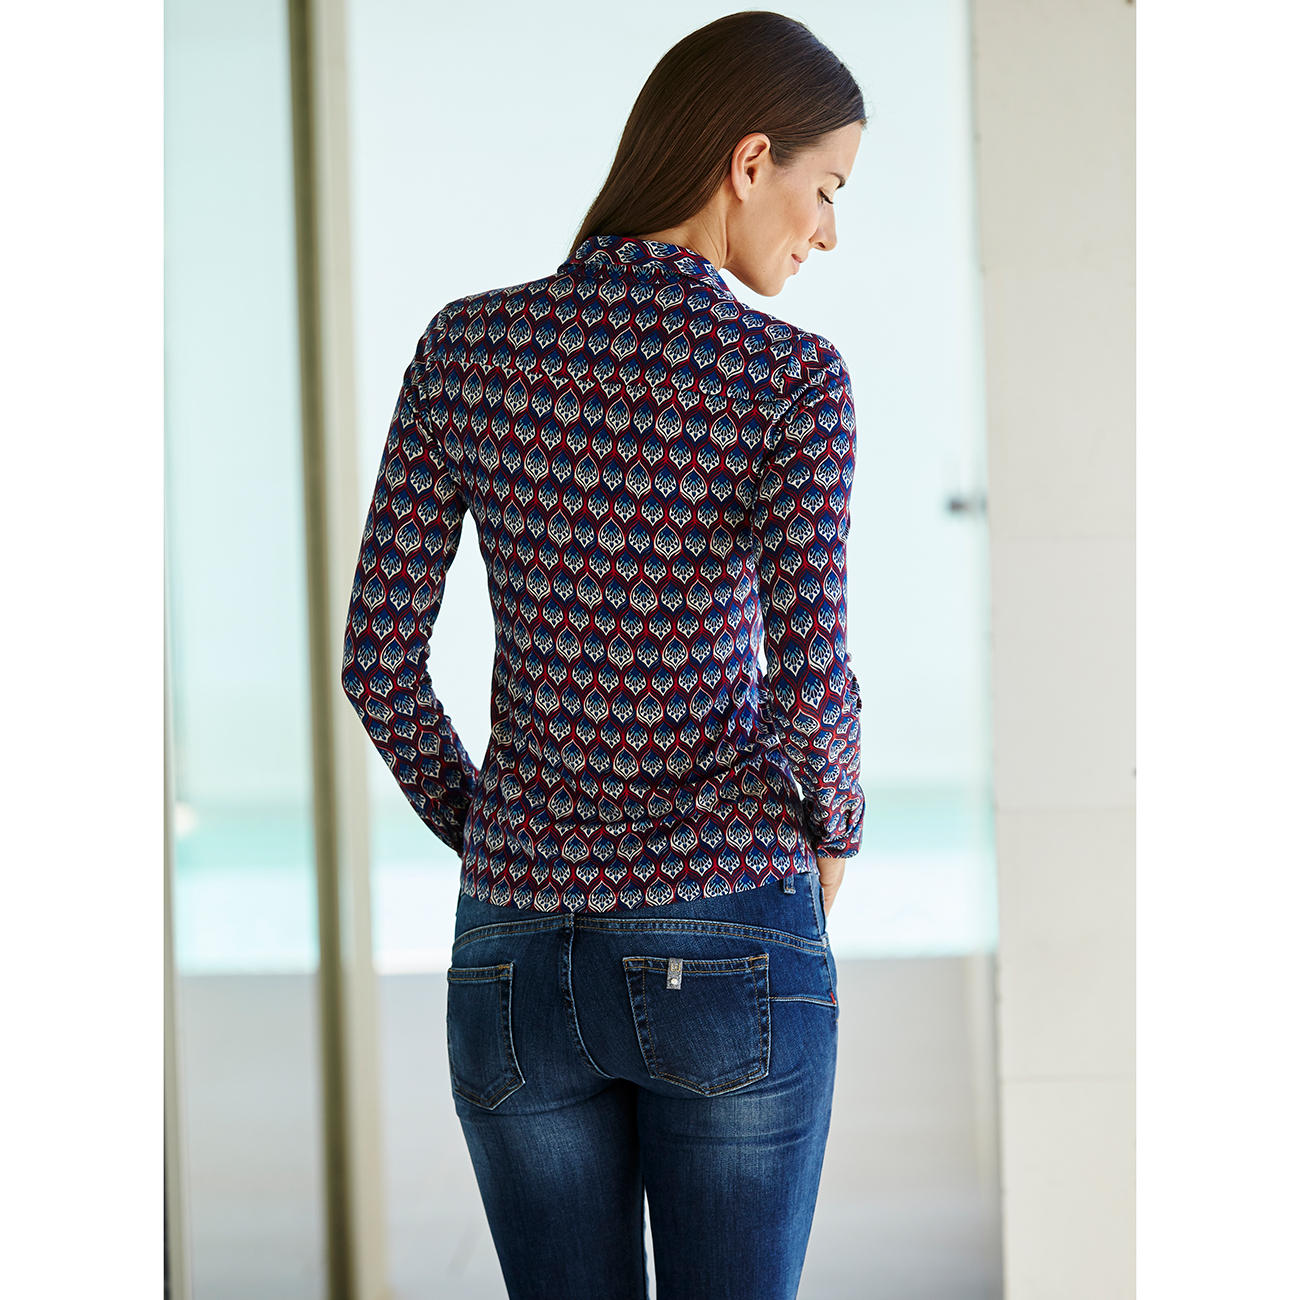 088fc093ac9118 KD-Klaus Dilkrath Jersey Blouse - As elegant as a blouse. As comfortable as  a shirt.